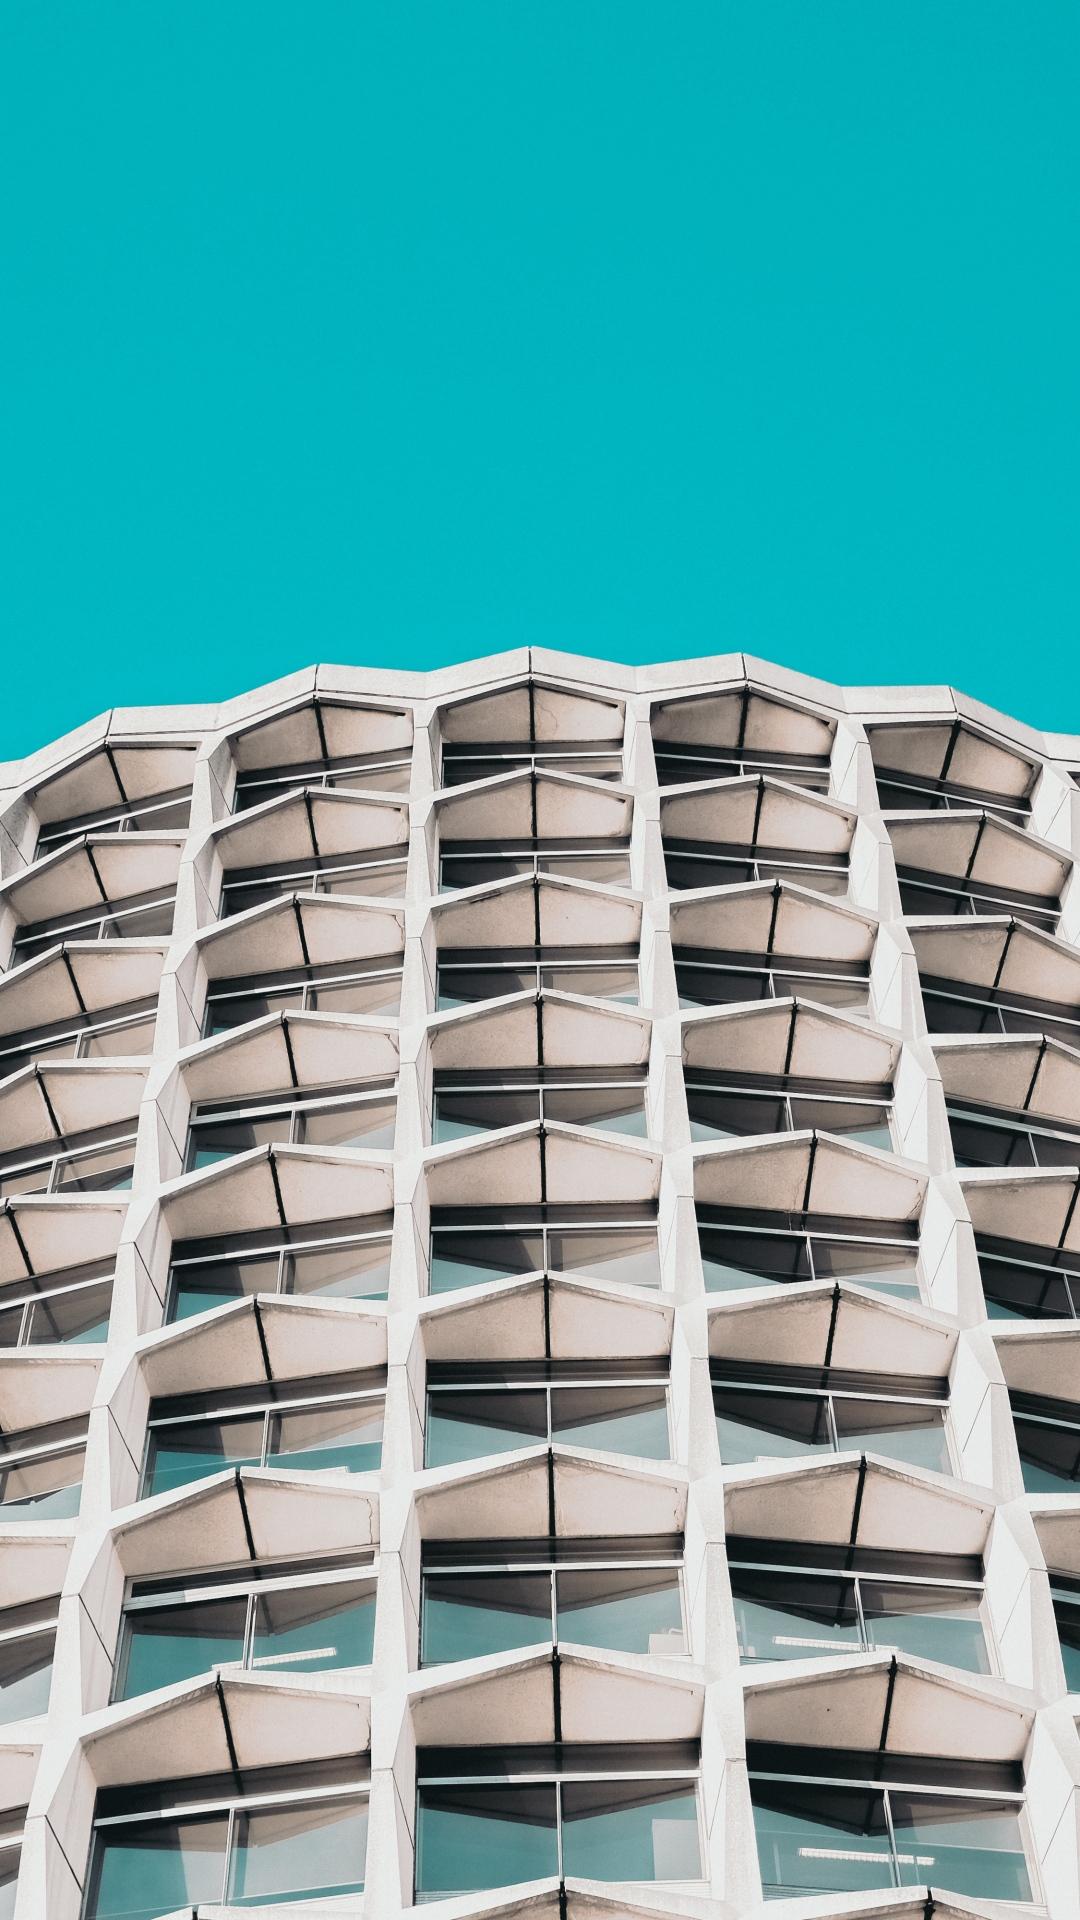 iphone wallpaper building facade architecture sky design Architecture